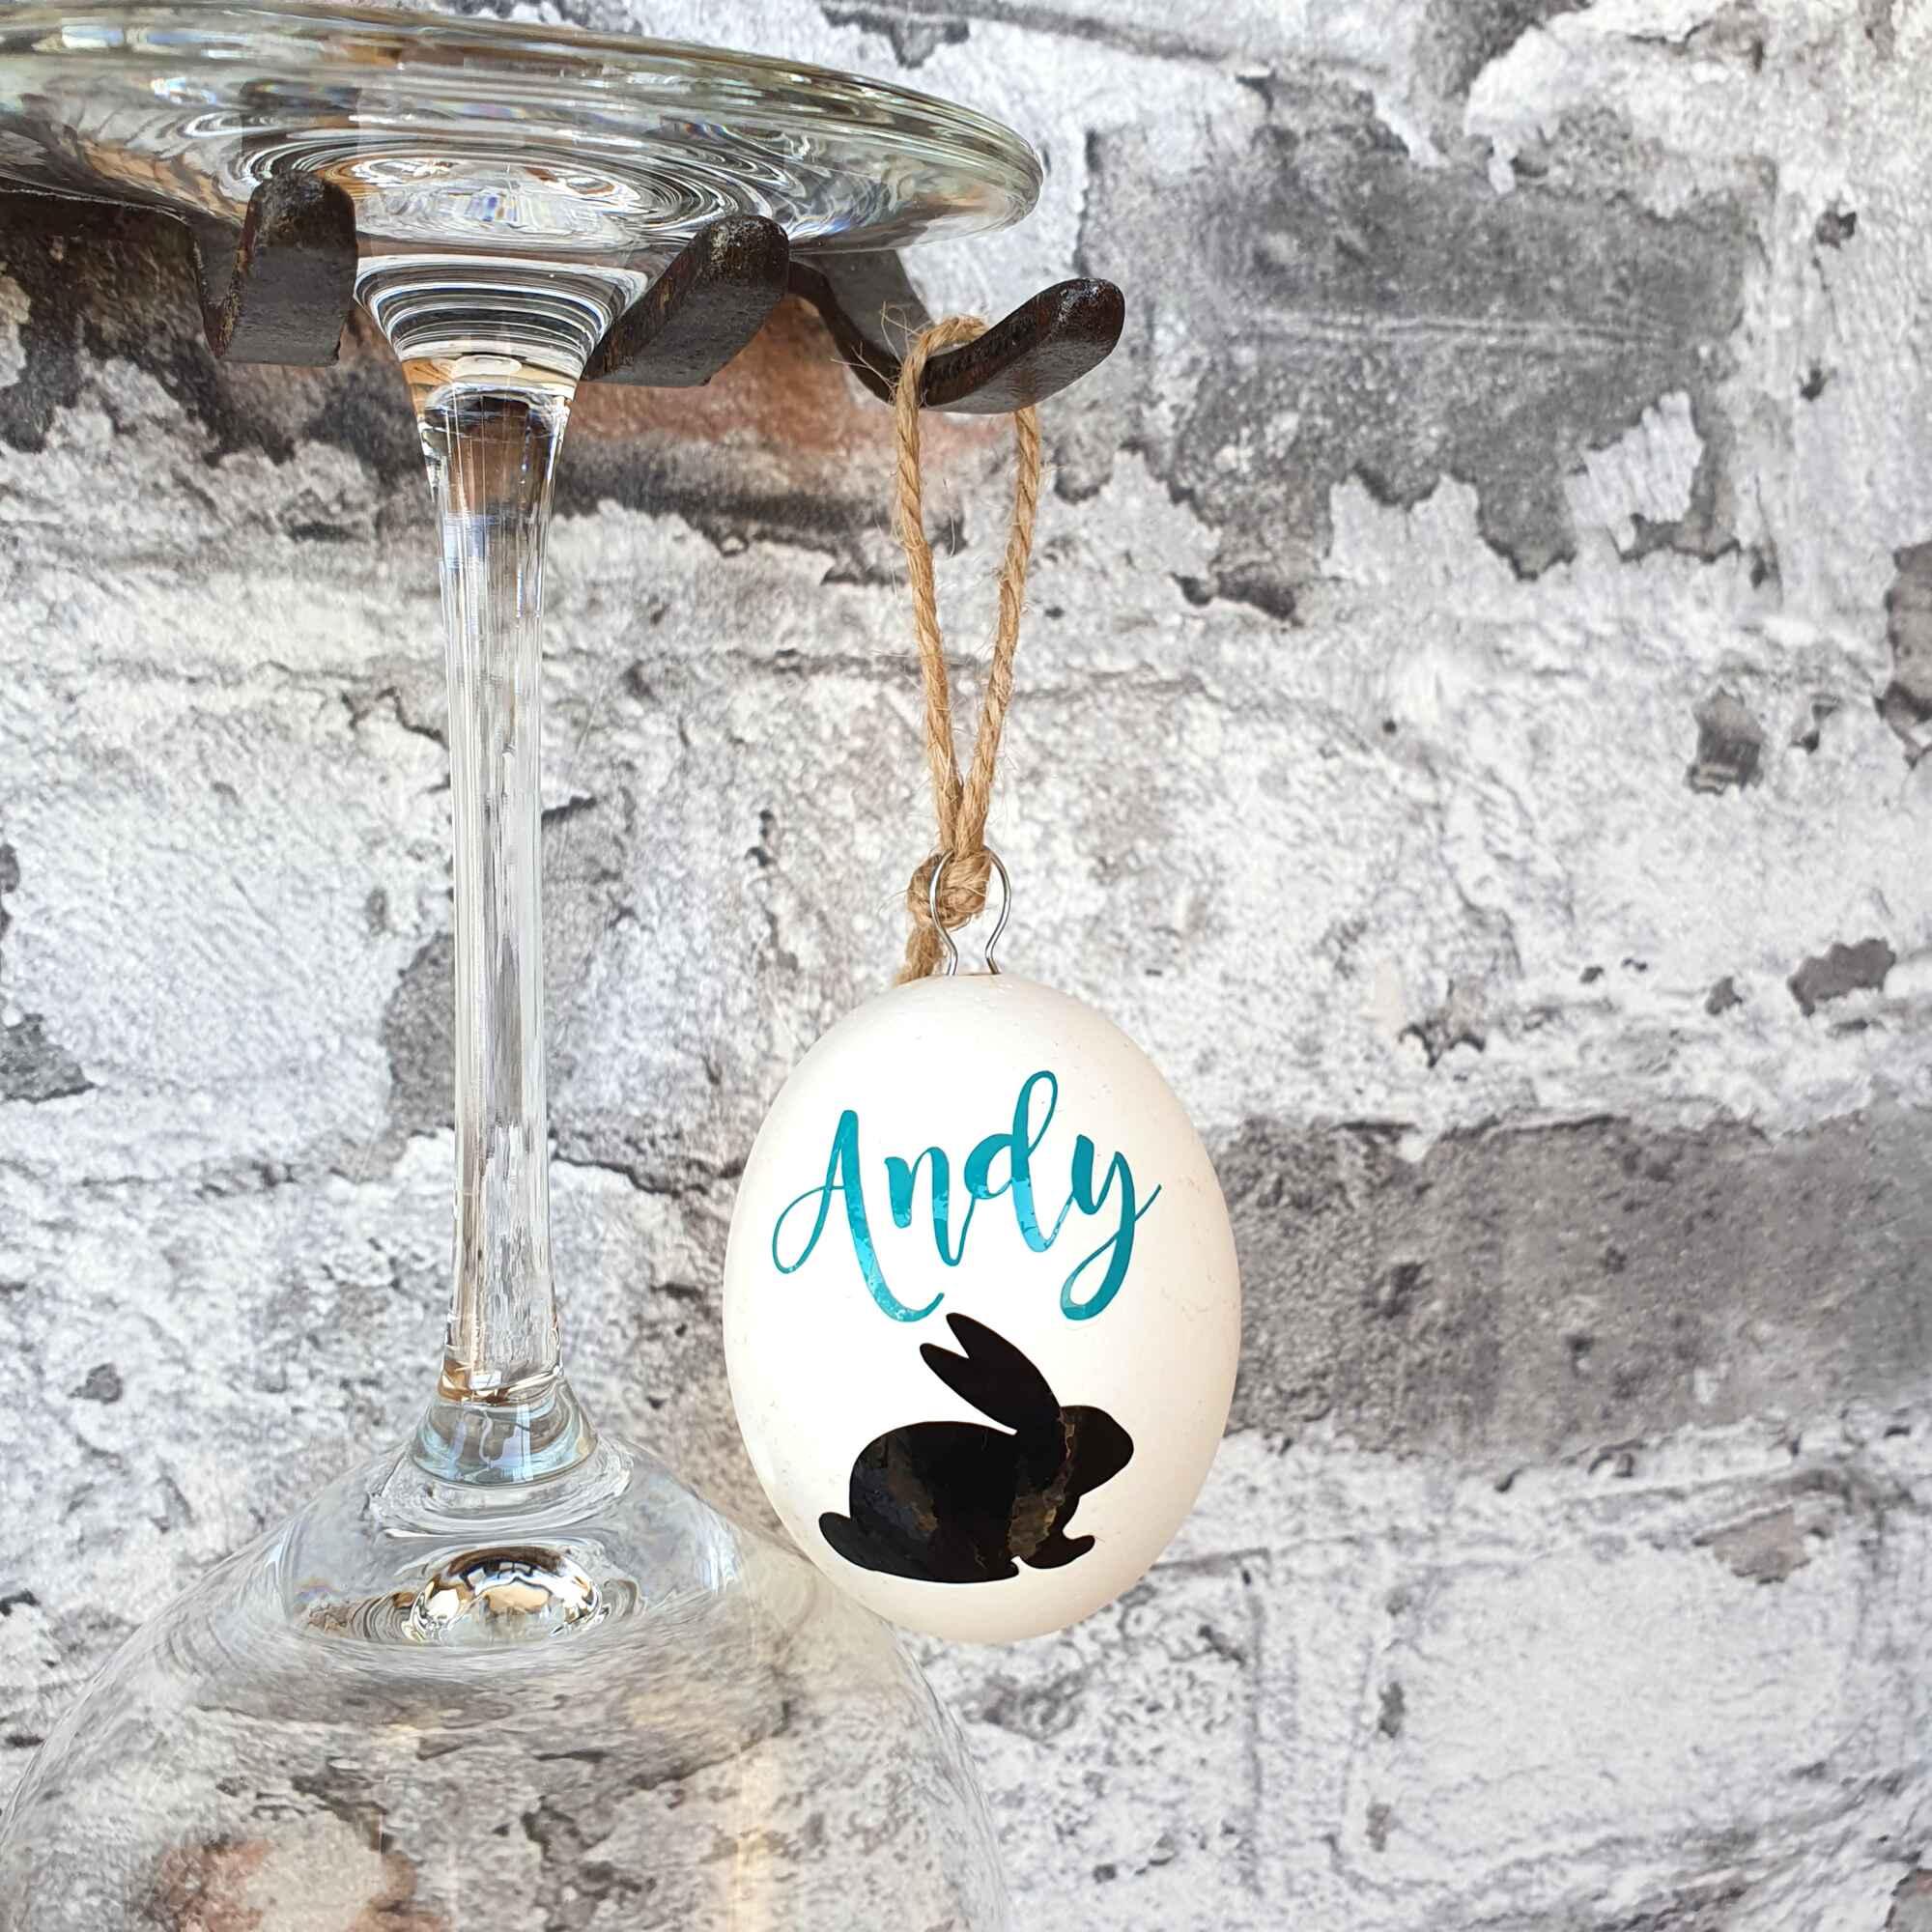 Osterei personalisiert Ostergeschenk aufgehangen Andy